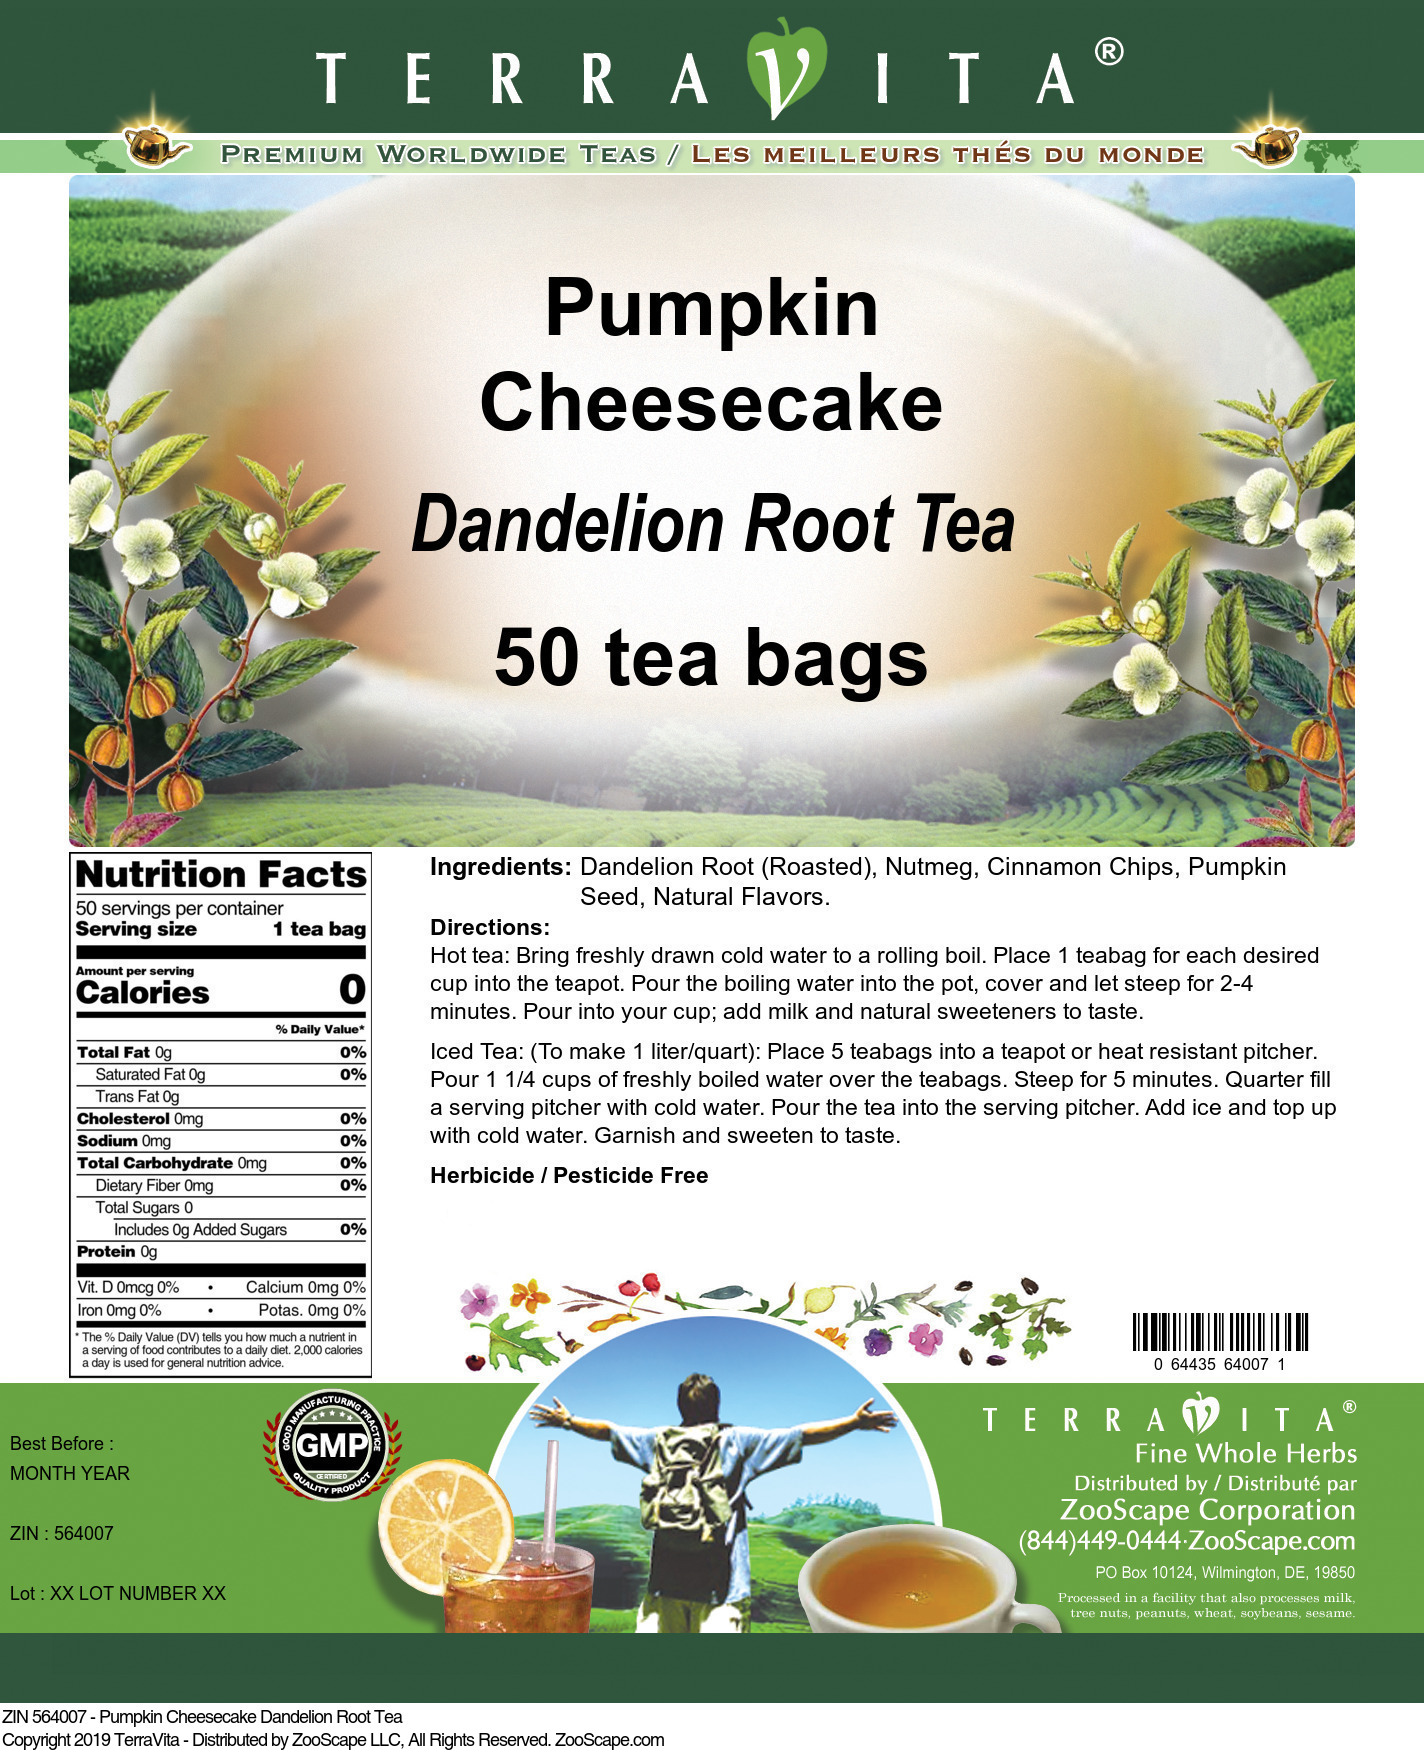 Pumpkin Cheesecake Dandelion Root